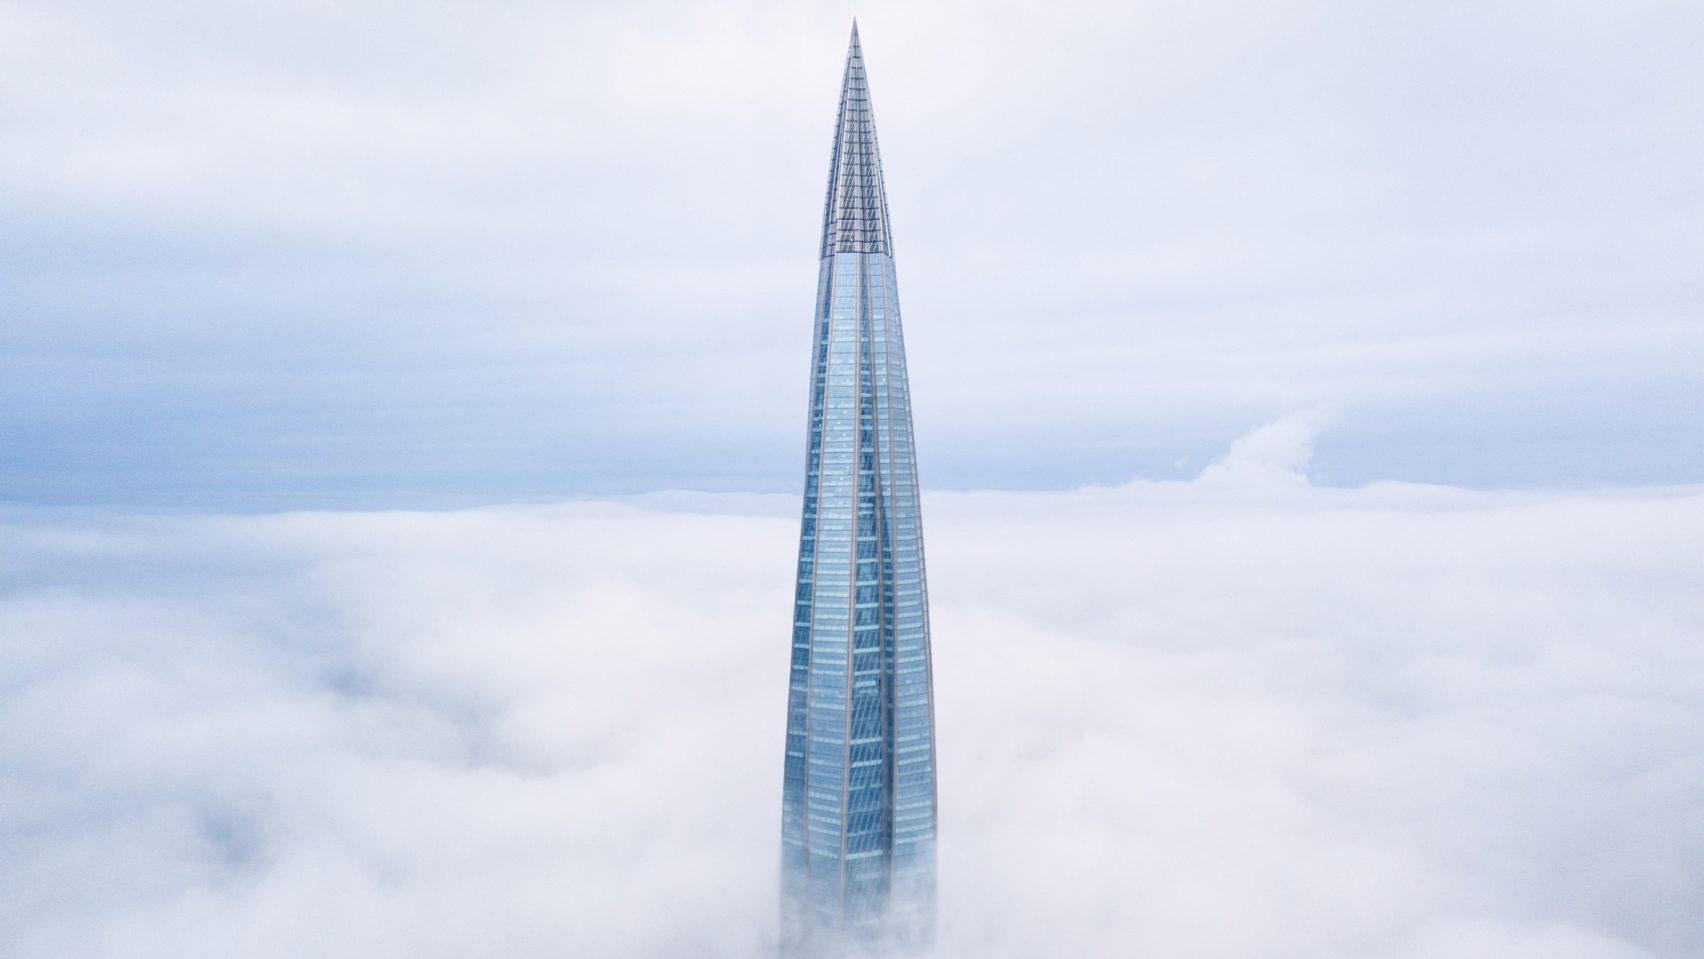 2018-skyscraper-review-hero_a-1704x959